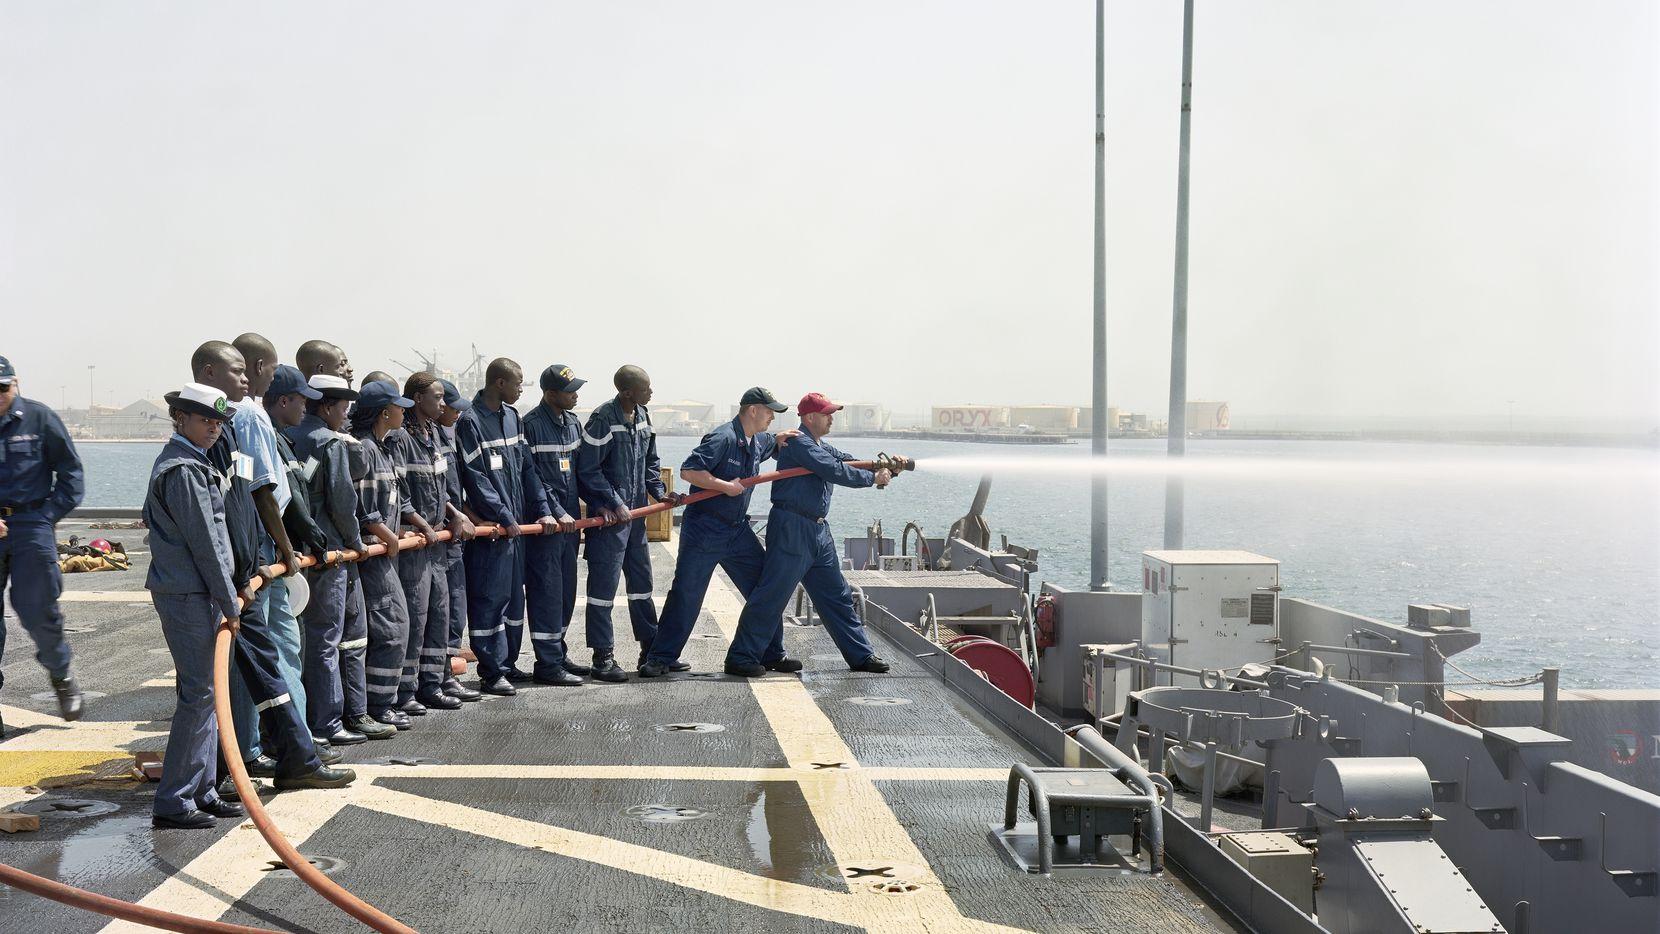 "Sailors train with a fire hose in An-My Lê's 2009 photograph ""Damage Control Training, USS Nashville, Dakar, Senegal."" (© An-My Lê. Courtesy of the artist and Marian Goodman Gallery, New York, Paris and London)"